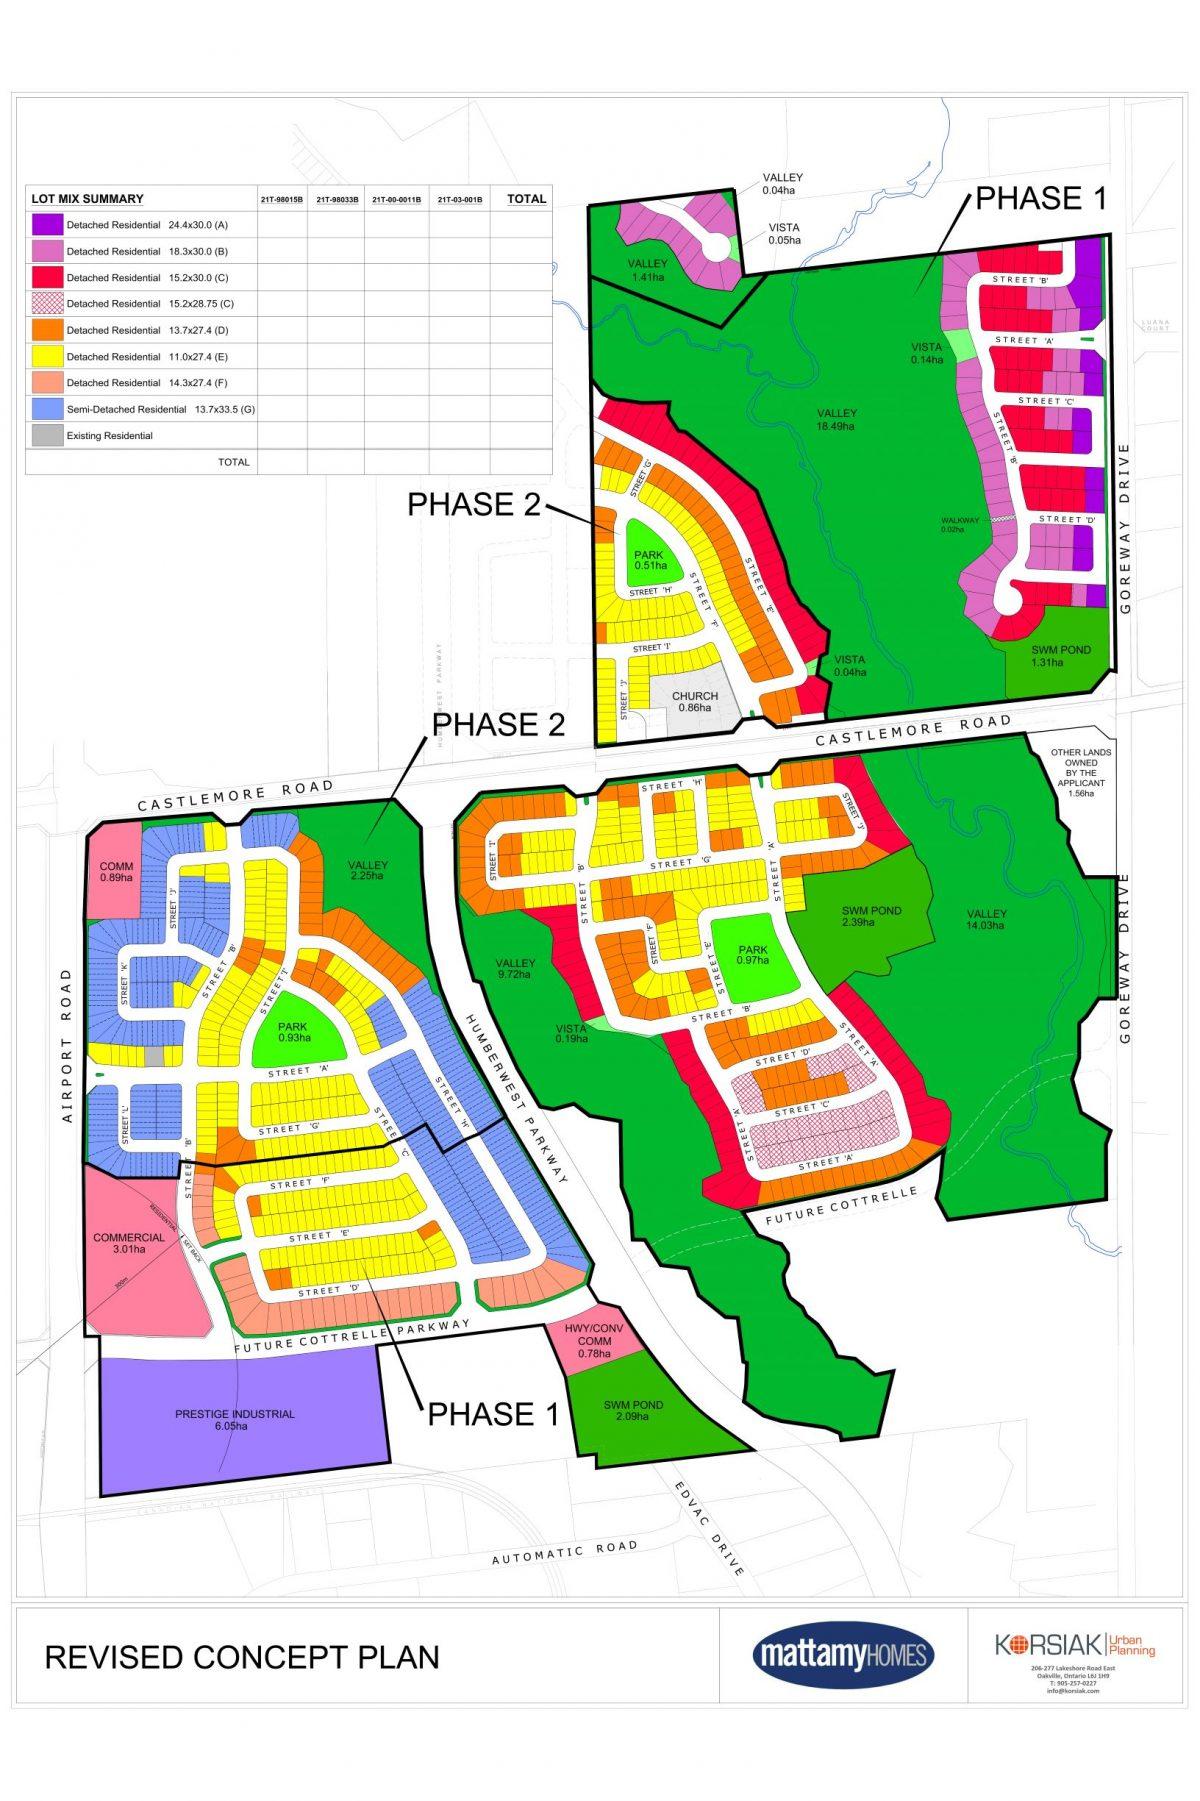 Korsiak Urban Planning - Brampton Portfolio - Cottrelle, Greenfield, Mixed Use Development - Brampton